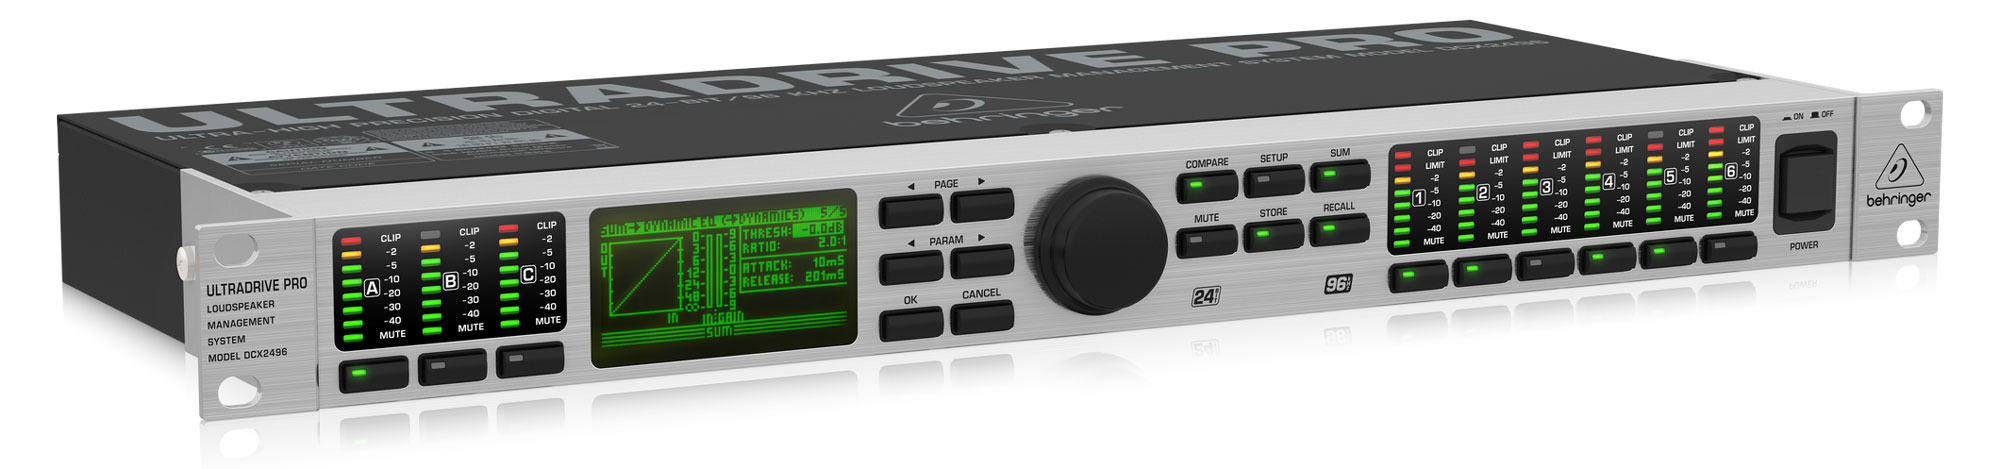 Studioeffekte - Behringer DCX2496 Ultra Drive Pro - Onlineshop Musikhaus Kirstein